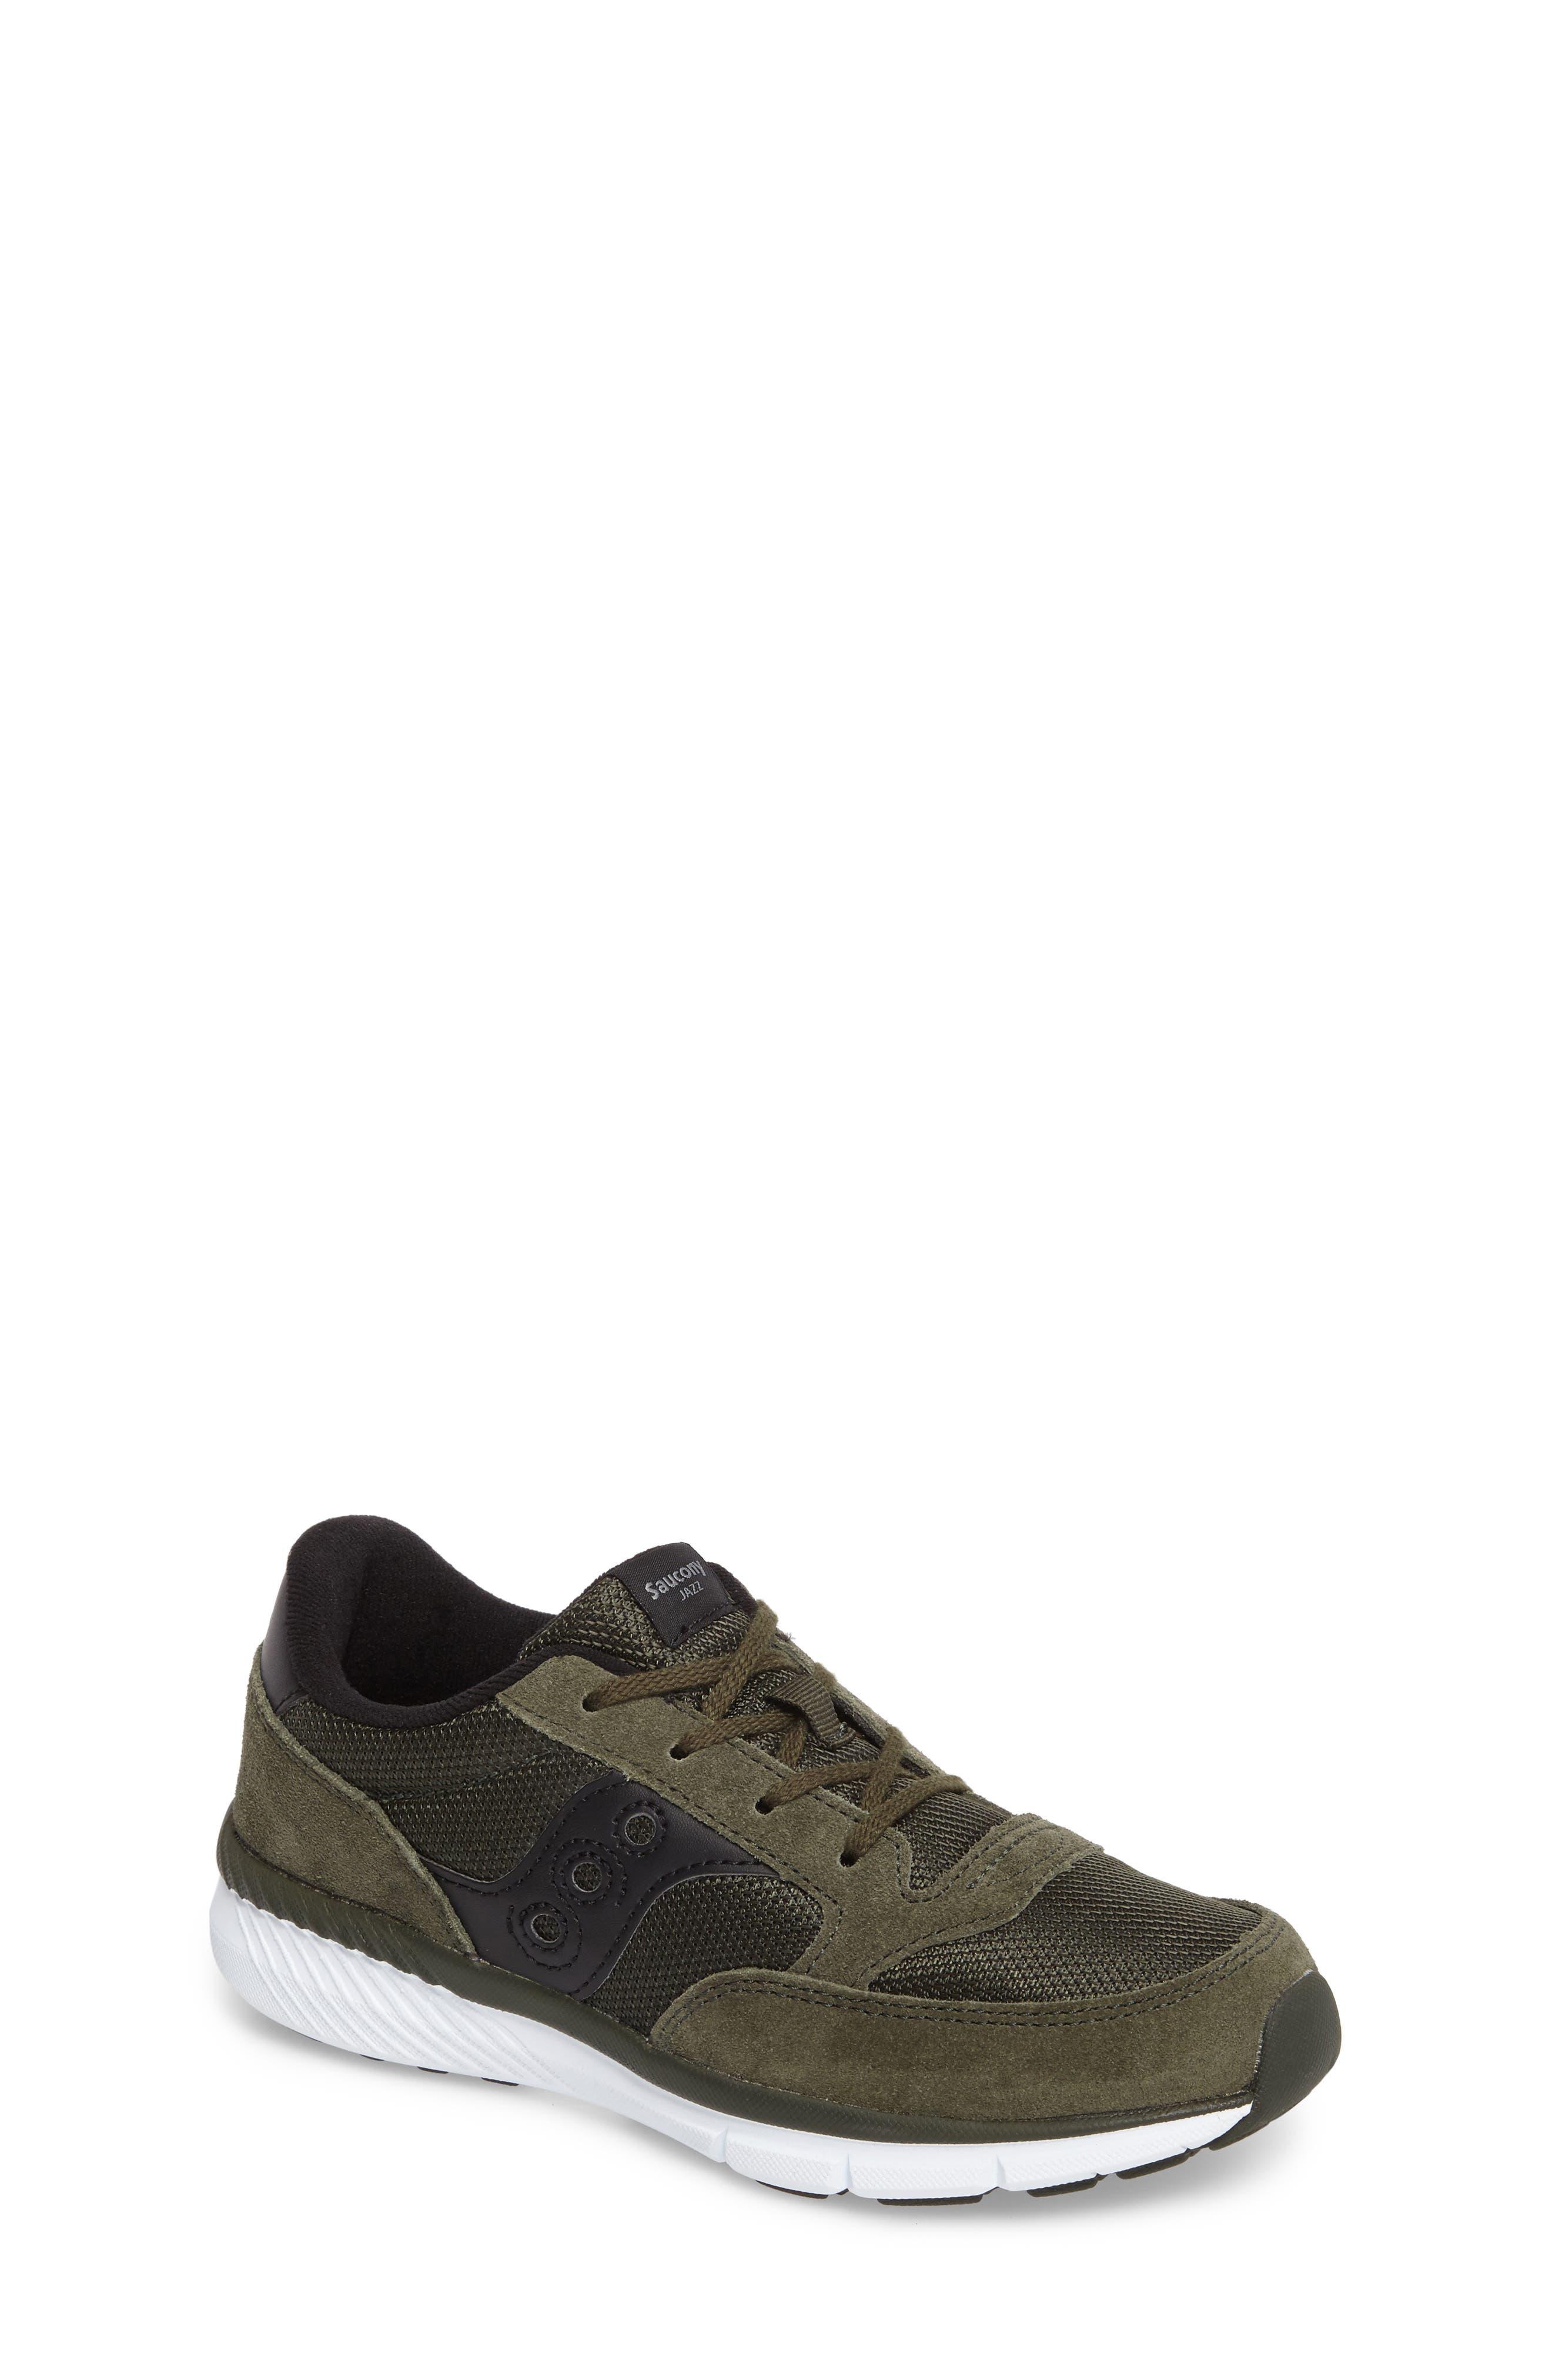 Jazz Lite Sneaker,                         Main,                         color,